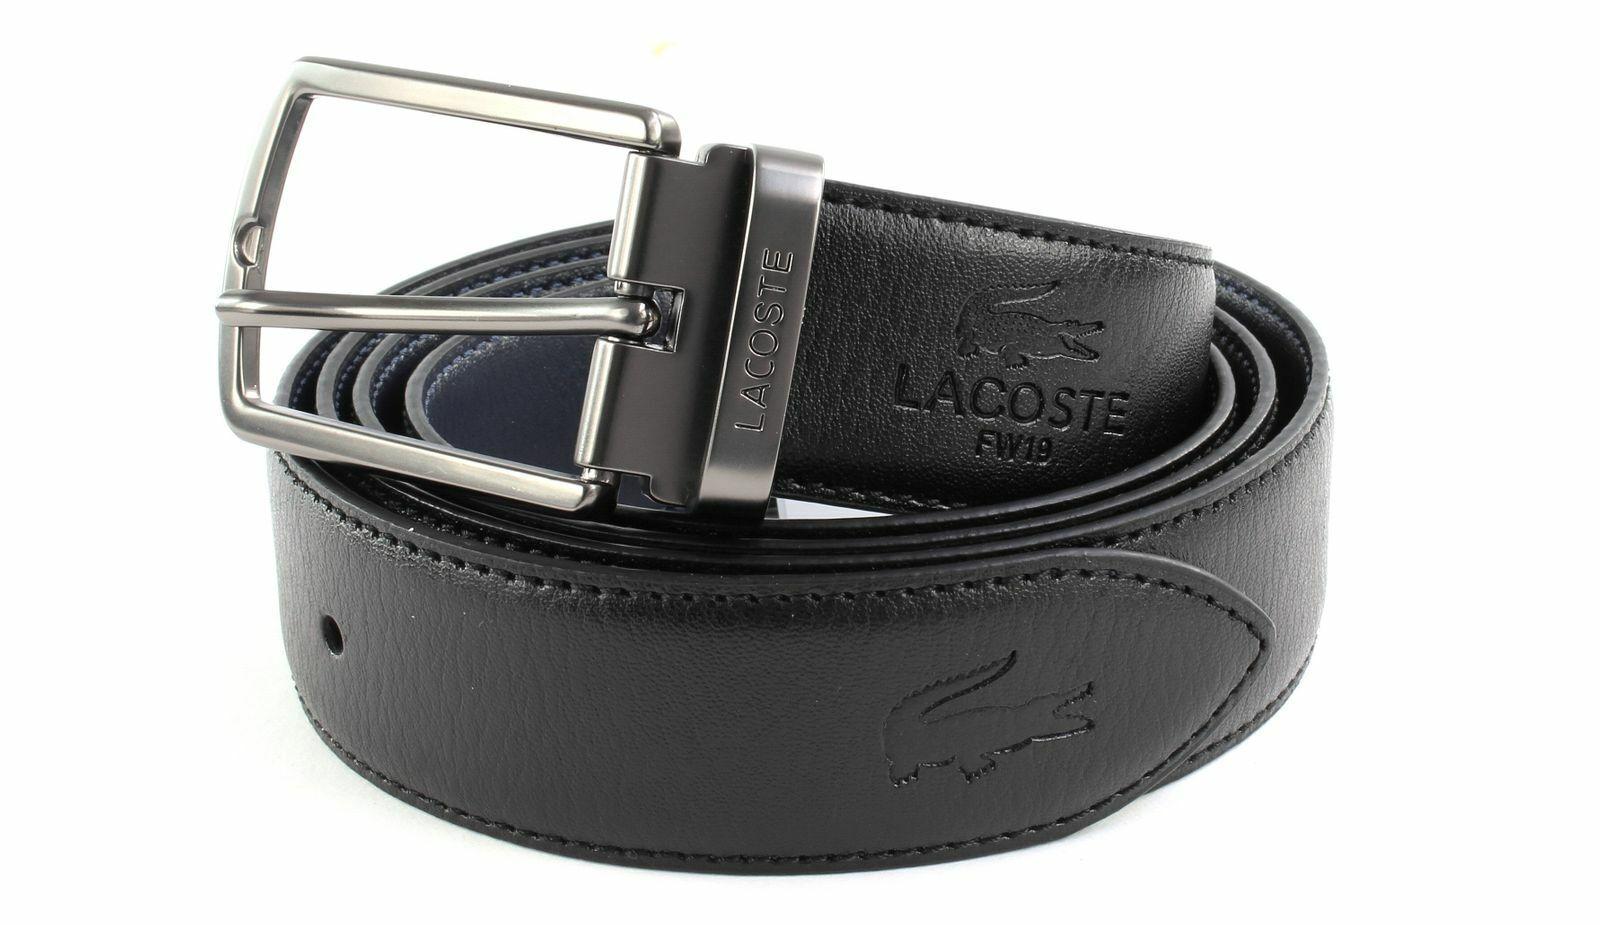 LACOSTE Men´s Elegance Reversible Belt W100 Gürtel Black Peacoat Schwarz Blau